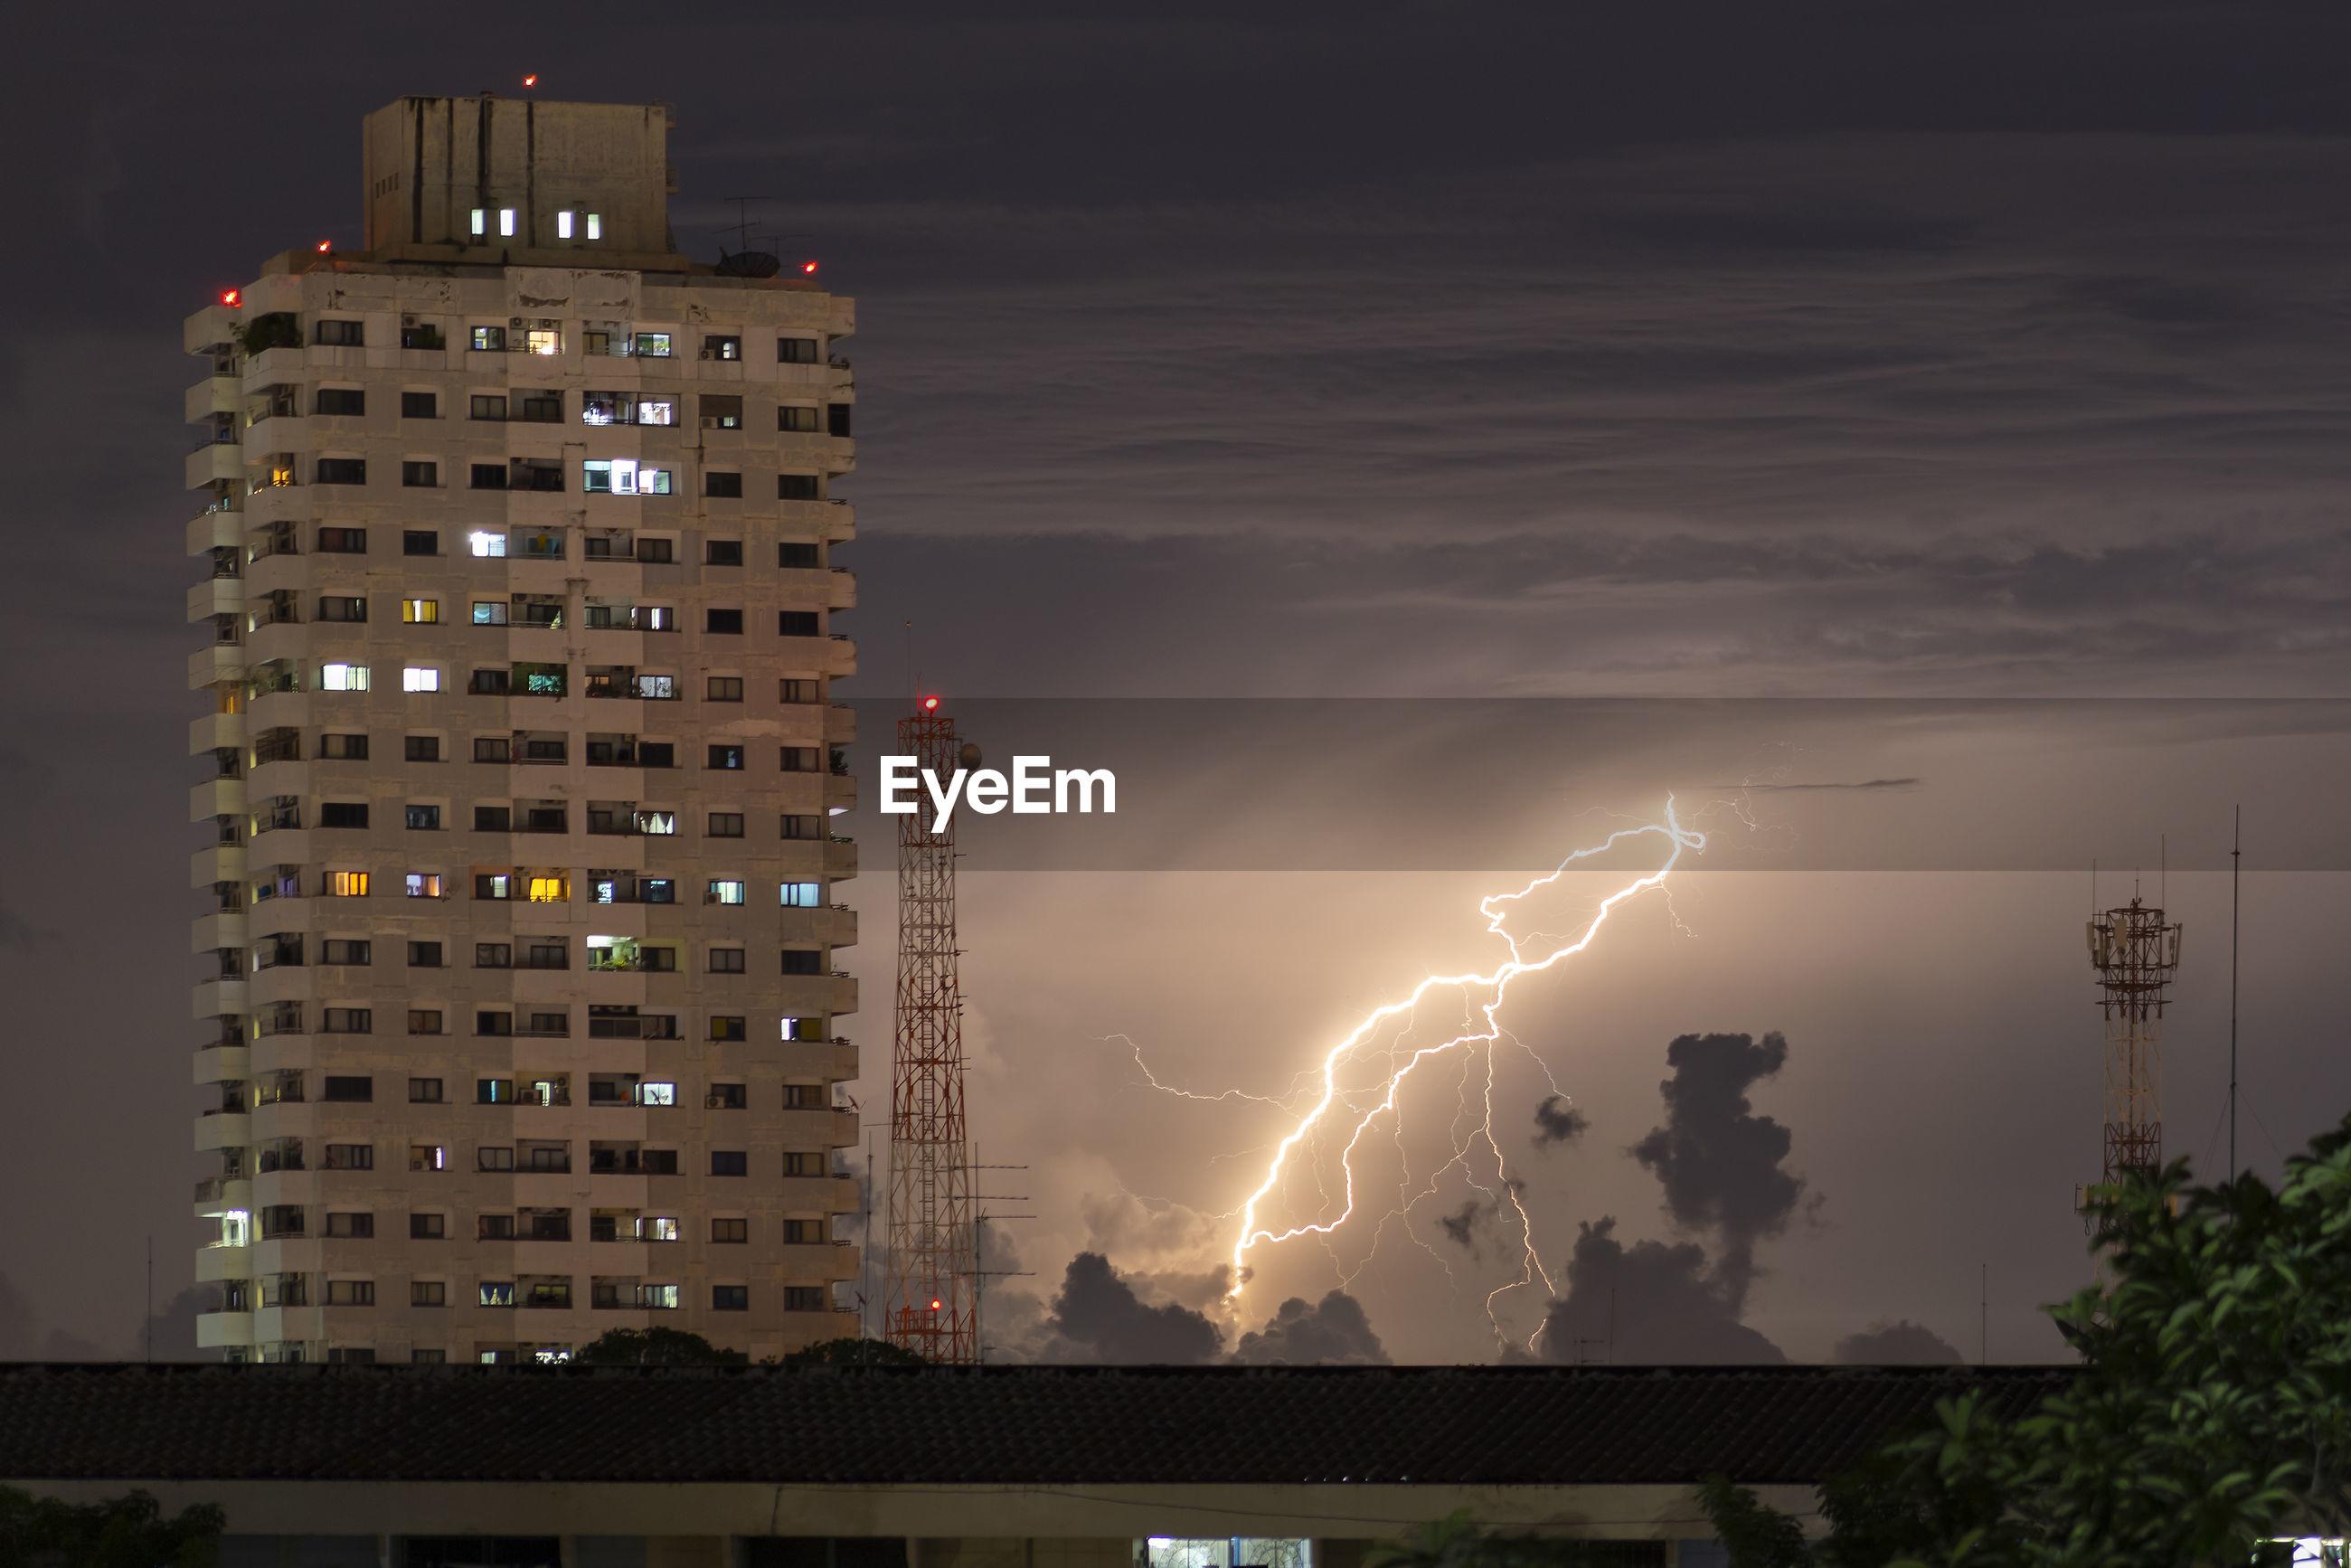 PANORAMIC SHOT OF ILLUMINATED BUILDINGS AGAINST SKY